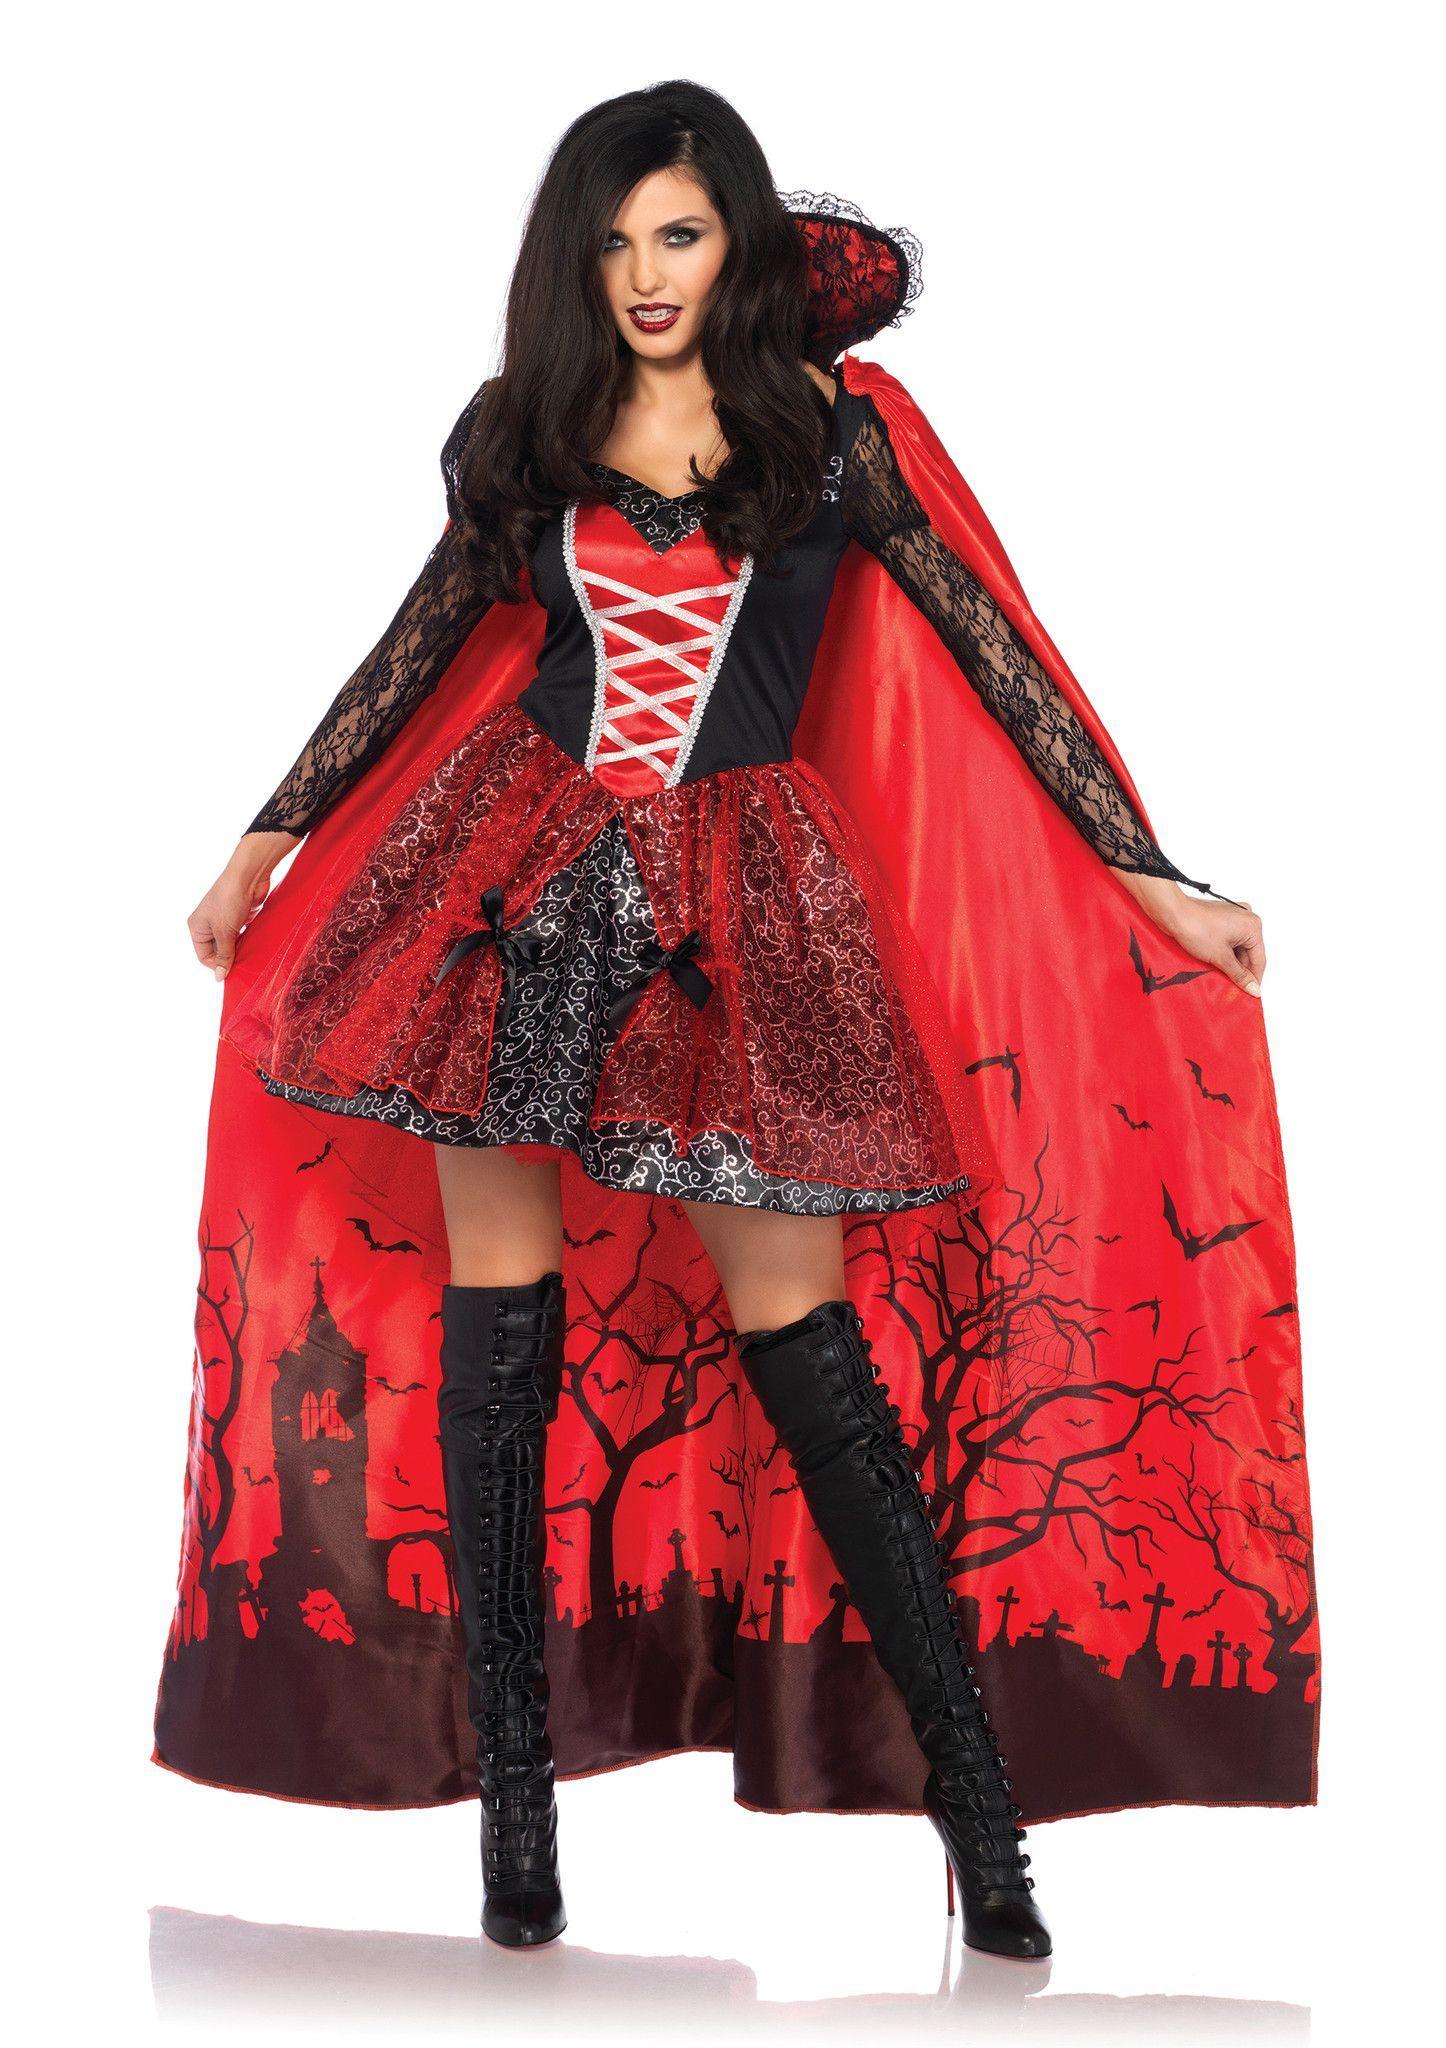 Vampire Temptress Costume Costumes For Women Halloween Fancy